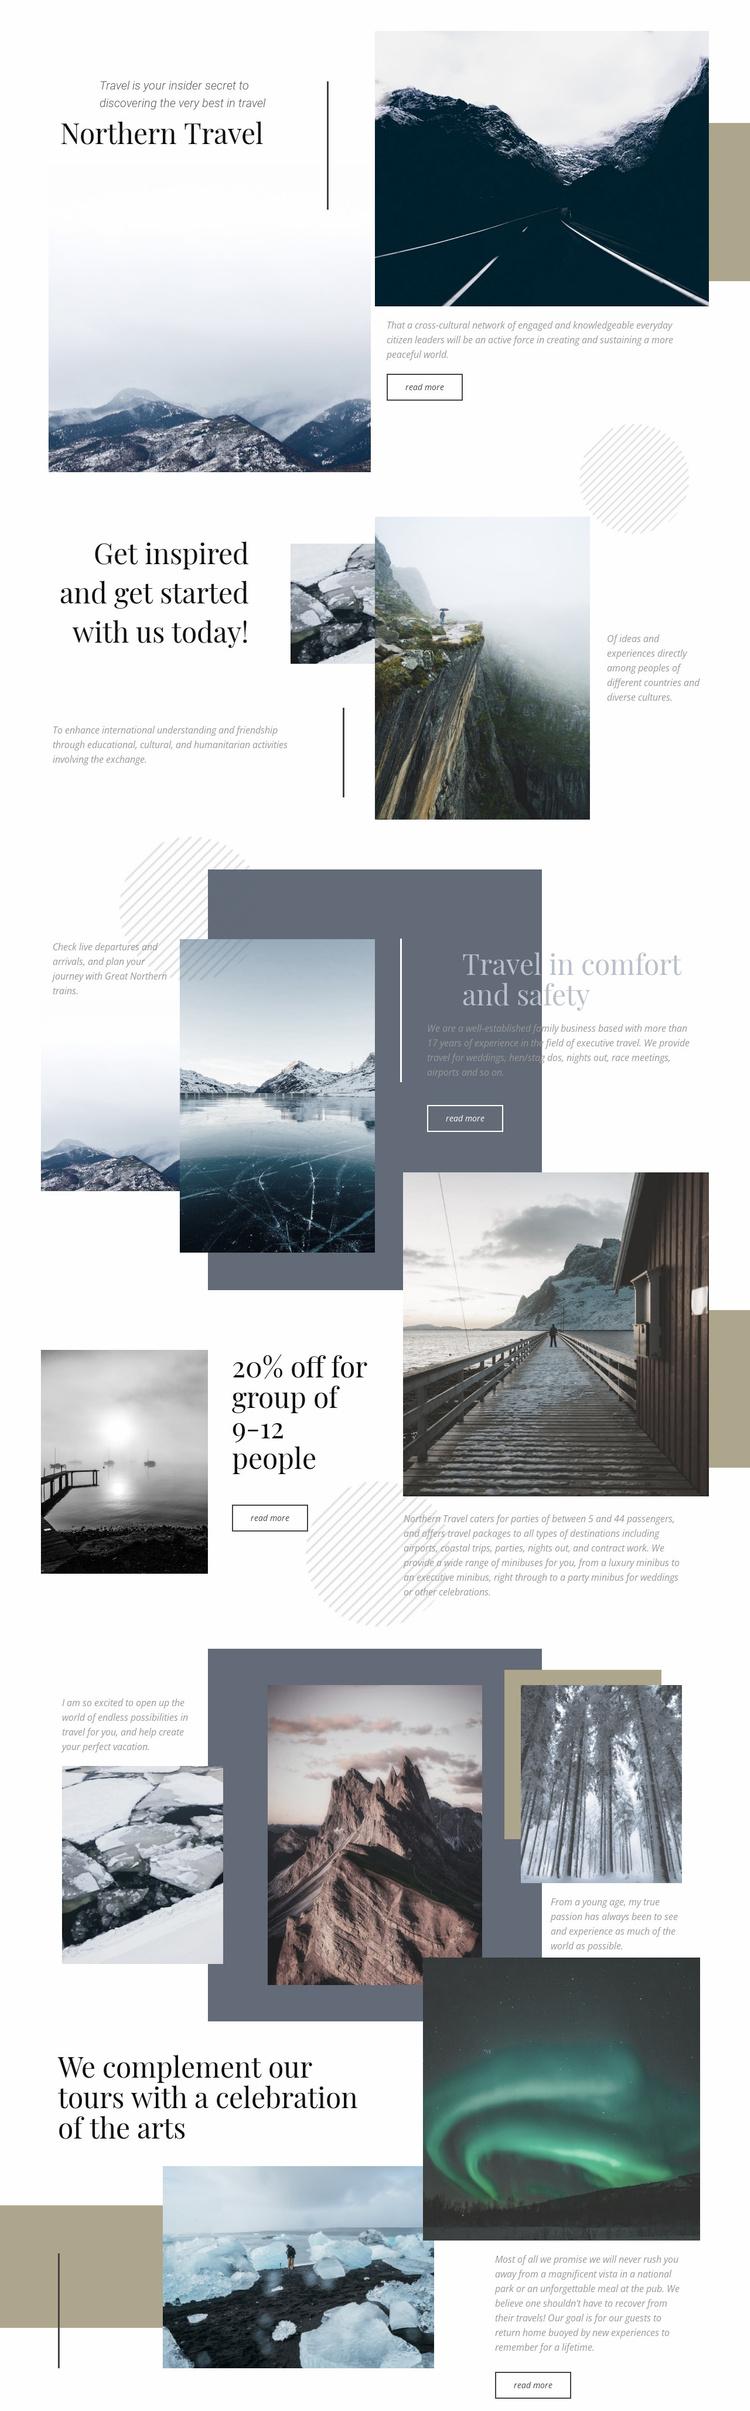 Northern Travel Website Template